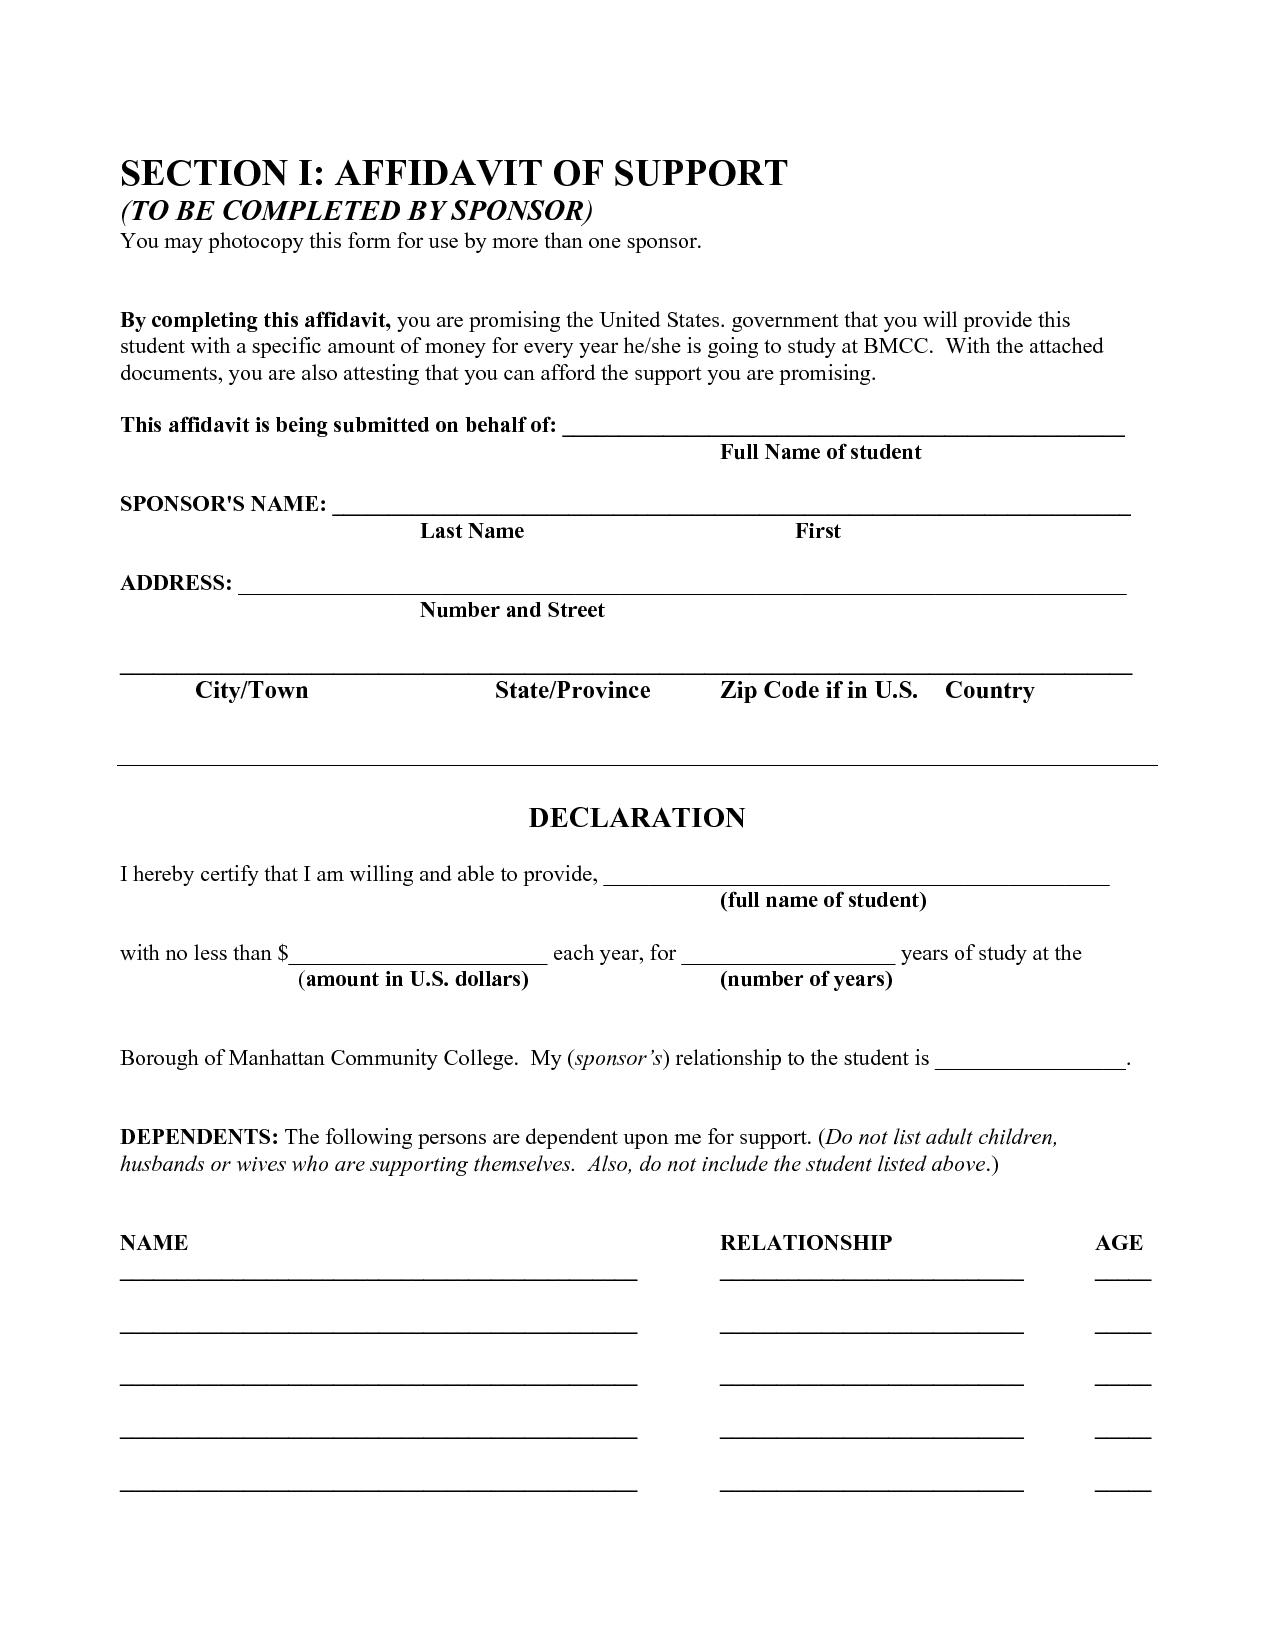 Free Affidavit Form by BeunaventuraLongjas affidavit templates – Free Form Templates